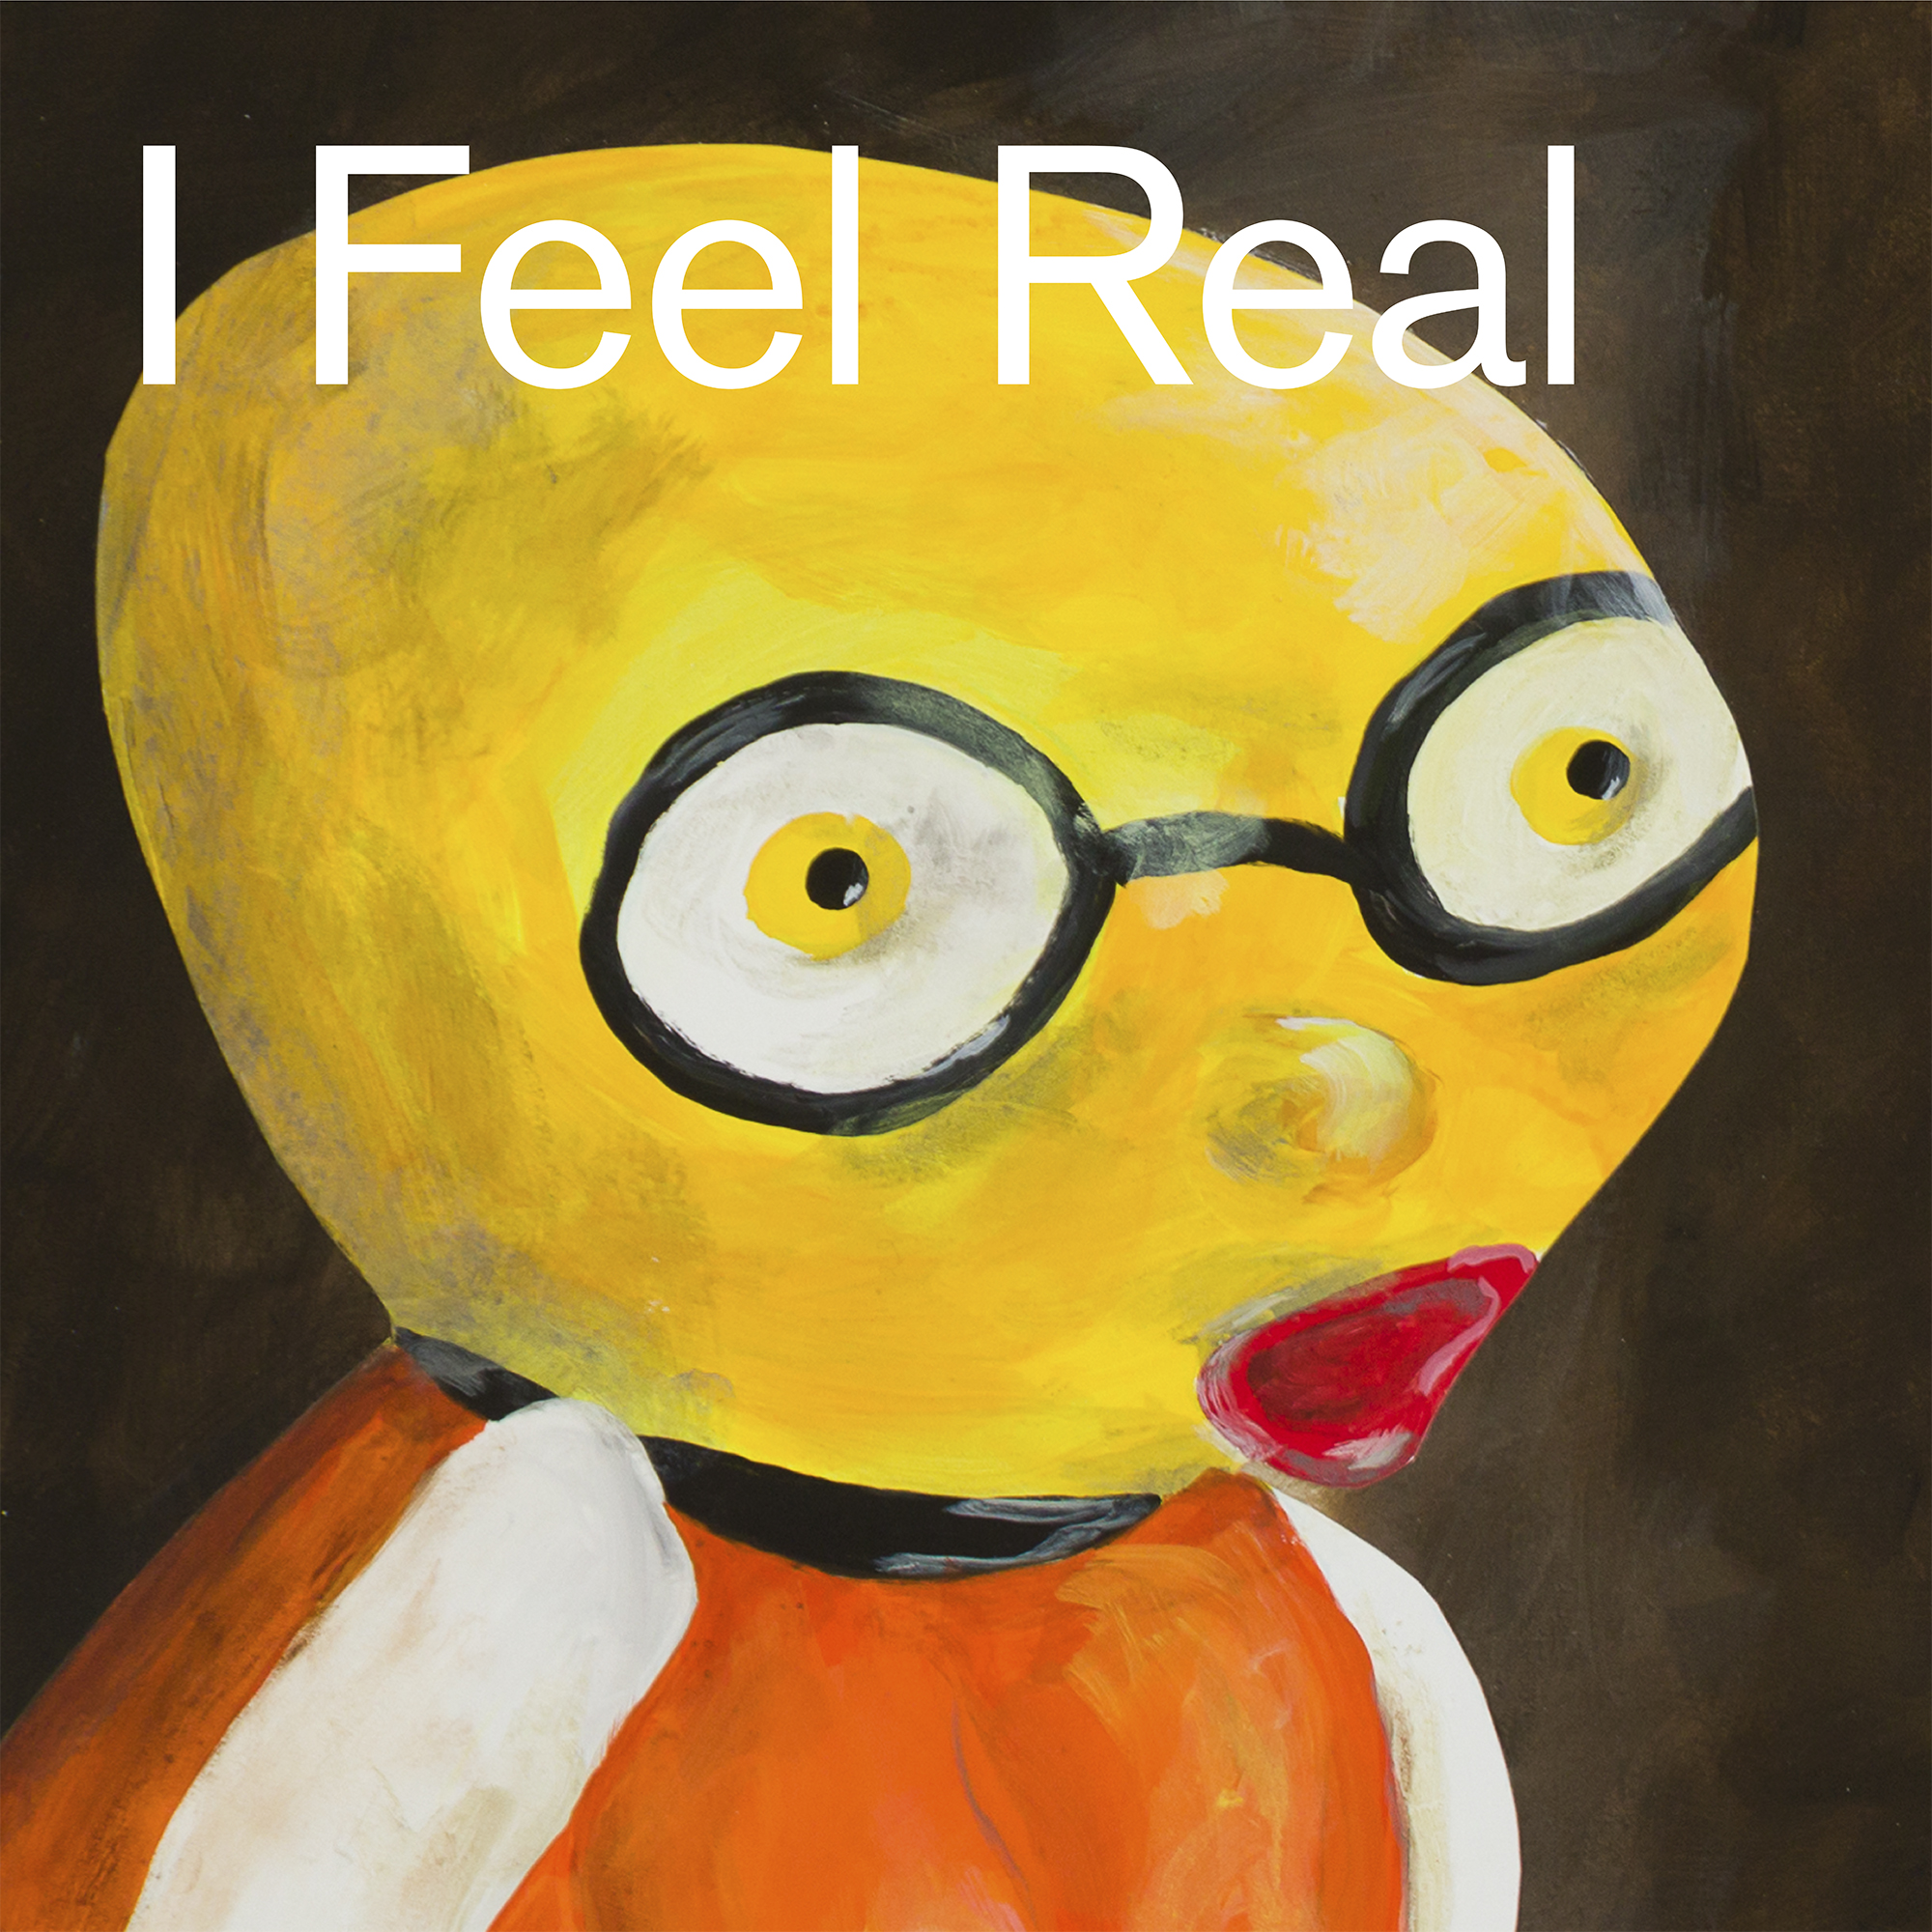 I Feel Real